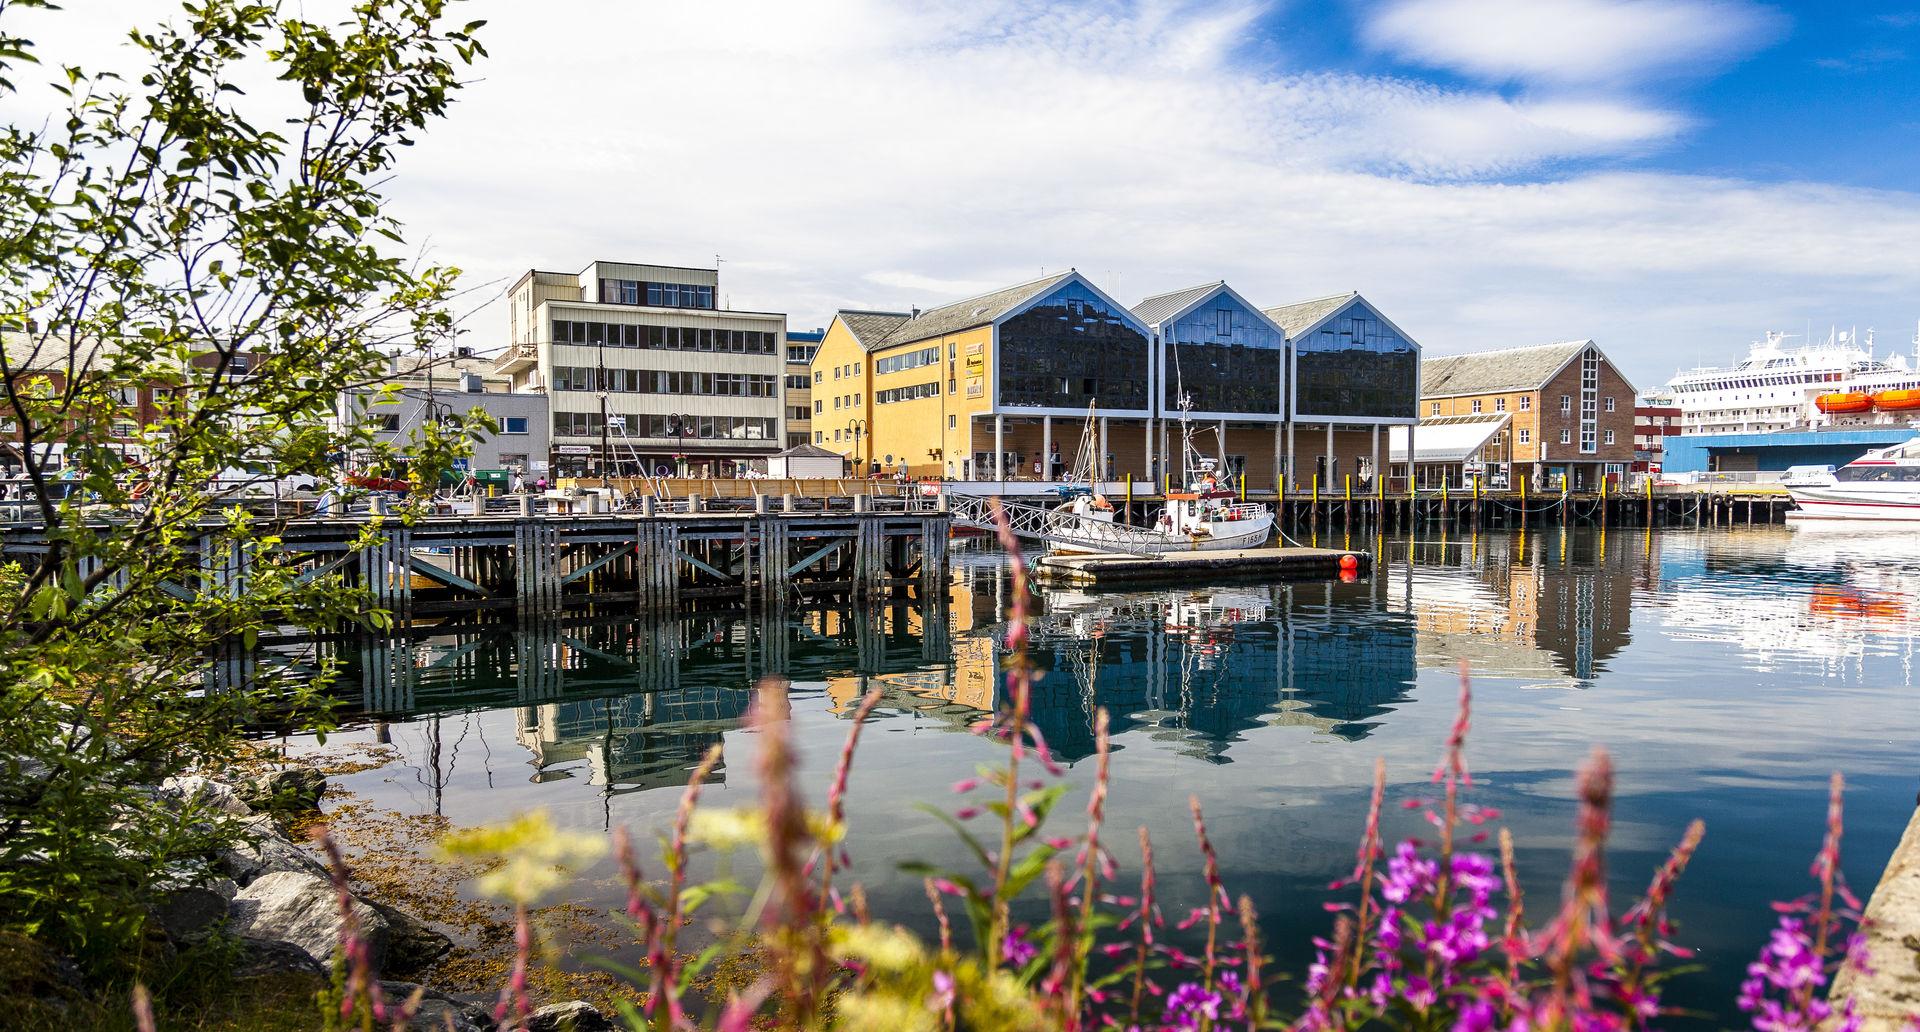 The Hurtigruten calls at Hammerfest on a beautiful day of Summer © Ziggi Wantuch